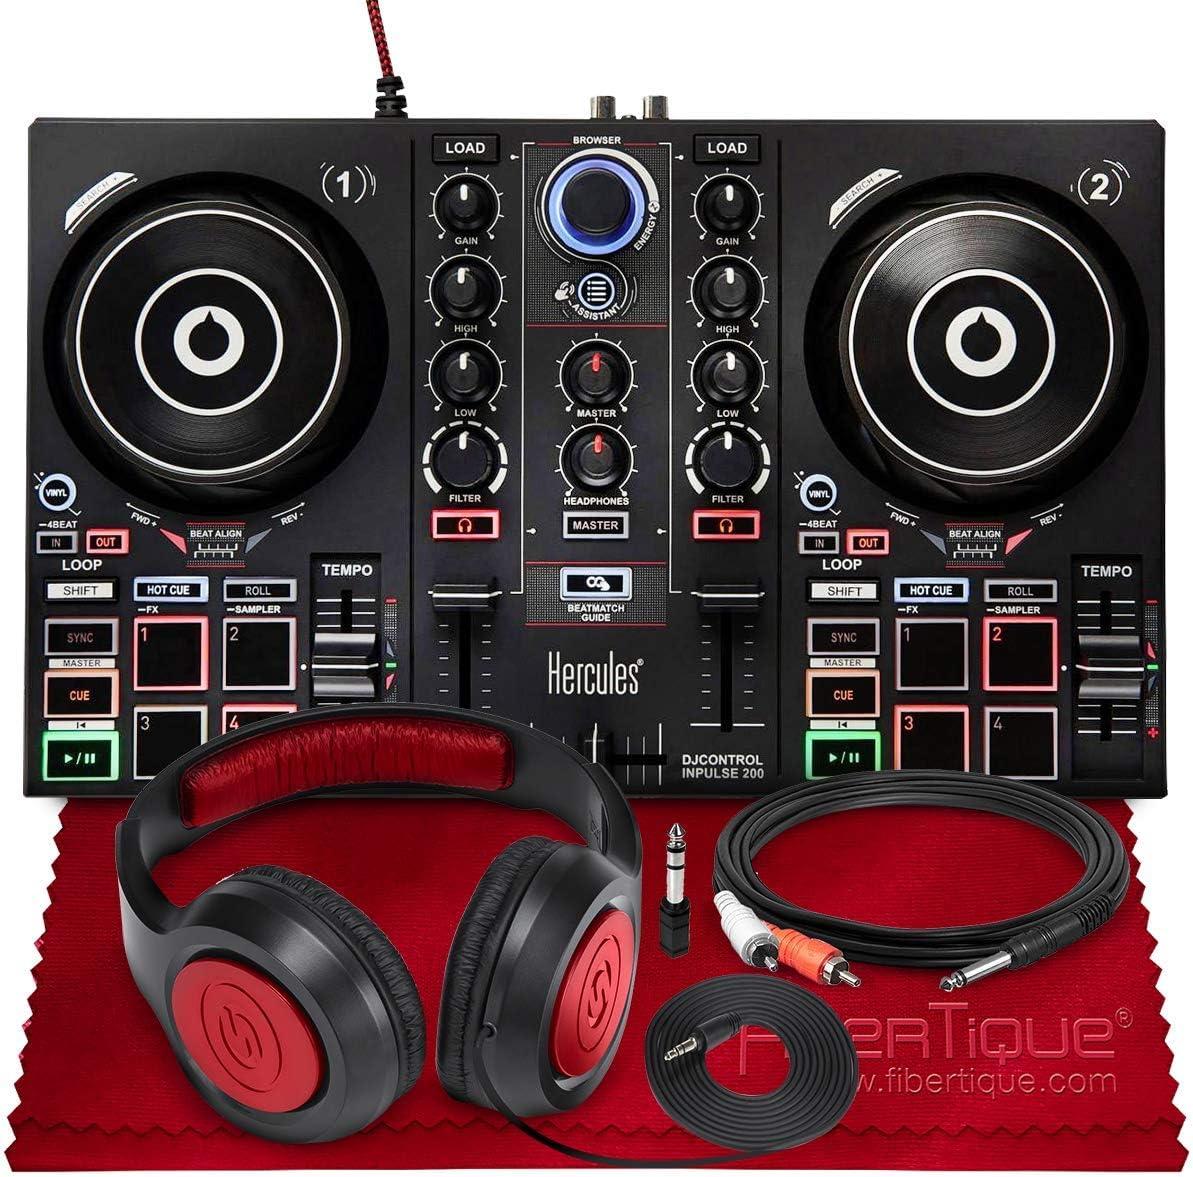 Outlet SALE Omaha Mall Hercules DJControl Inpulse 200 Compact + Headphone Controller DJ